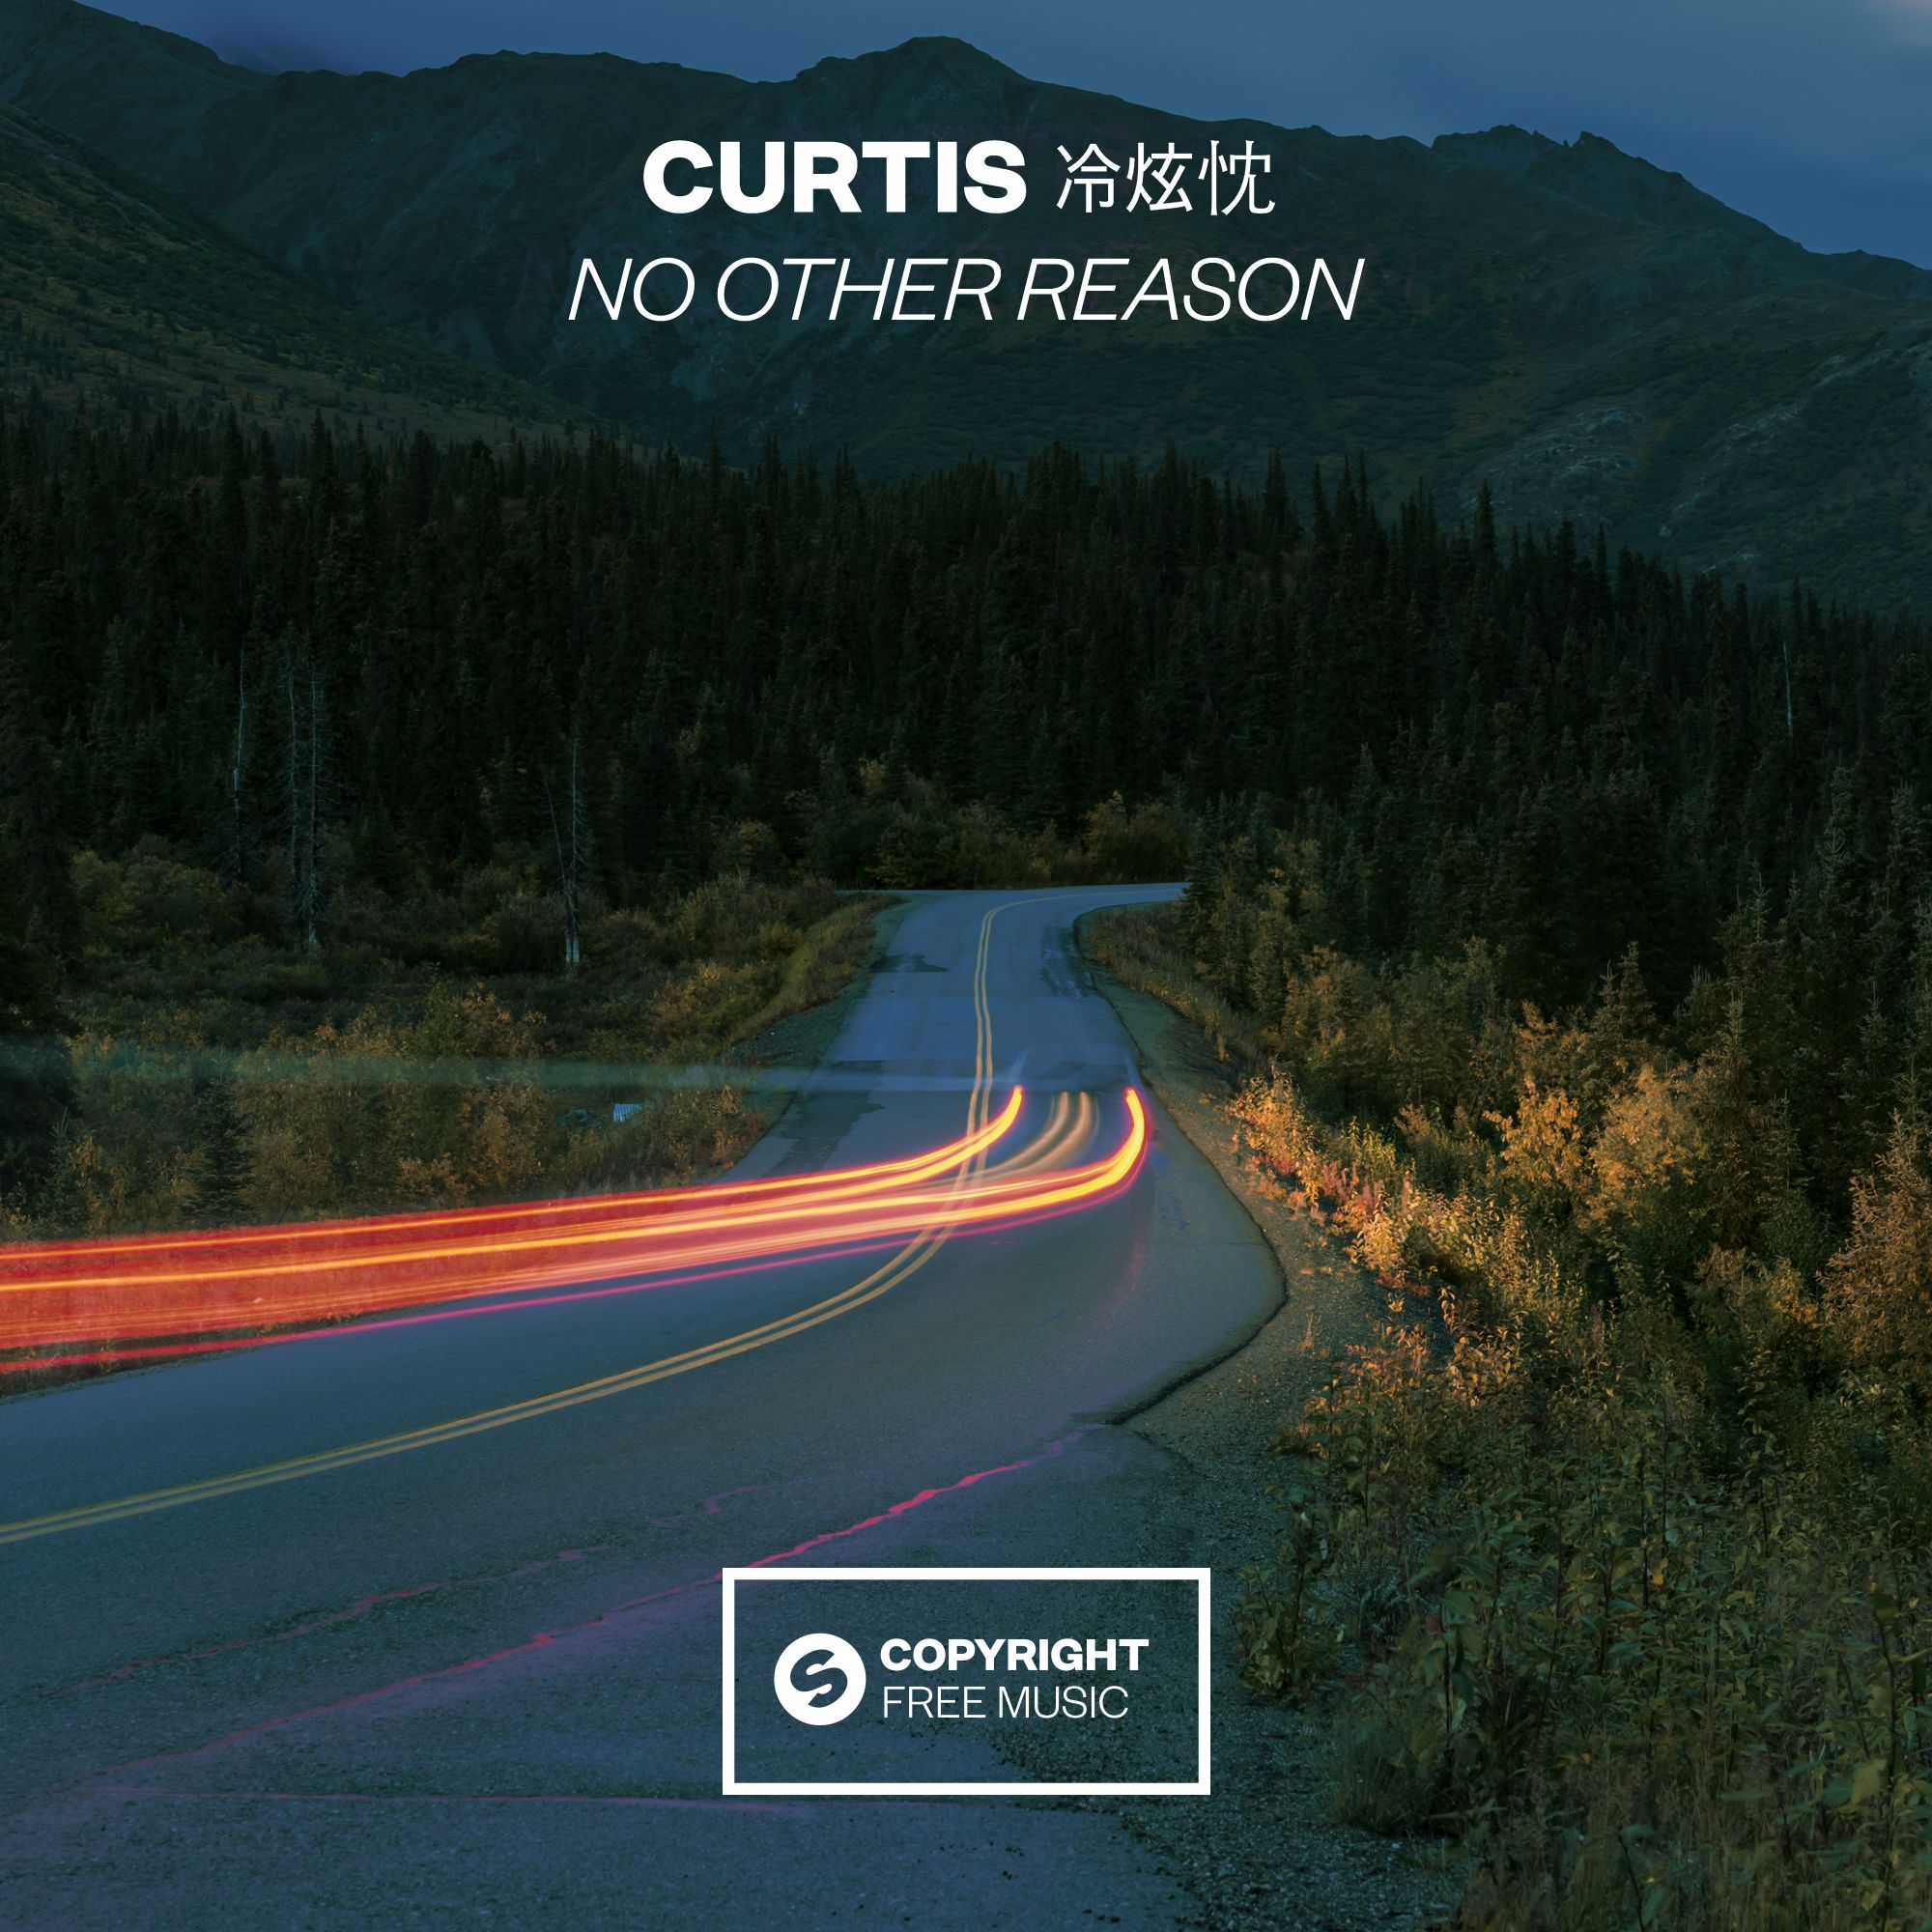 cfm_curtis_-_no_other_reason.jpg